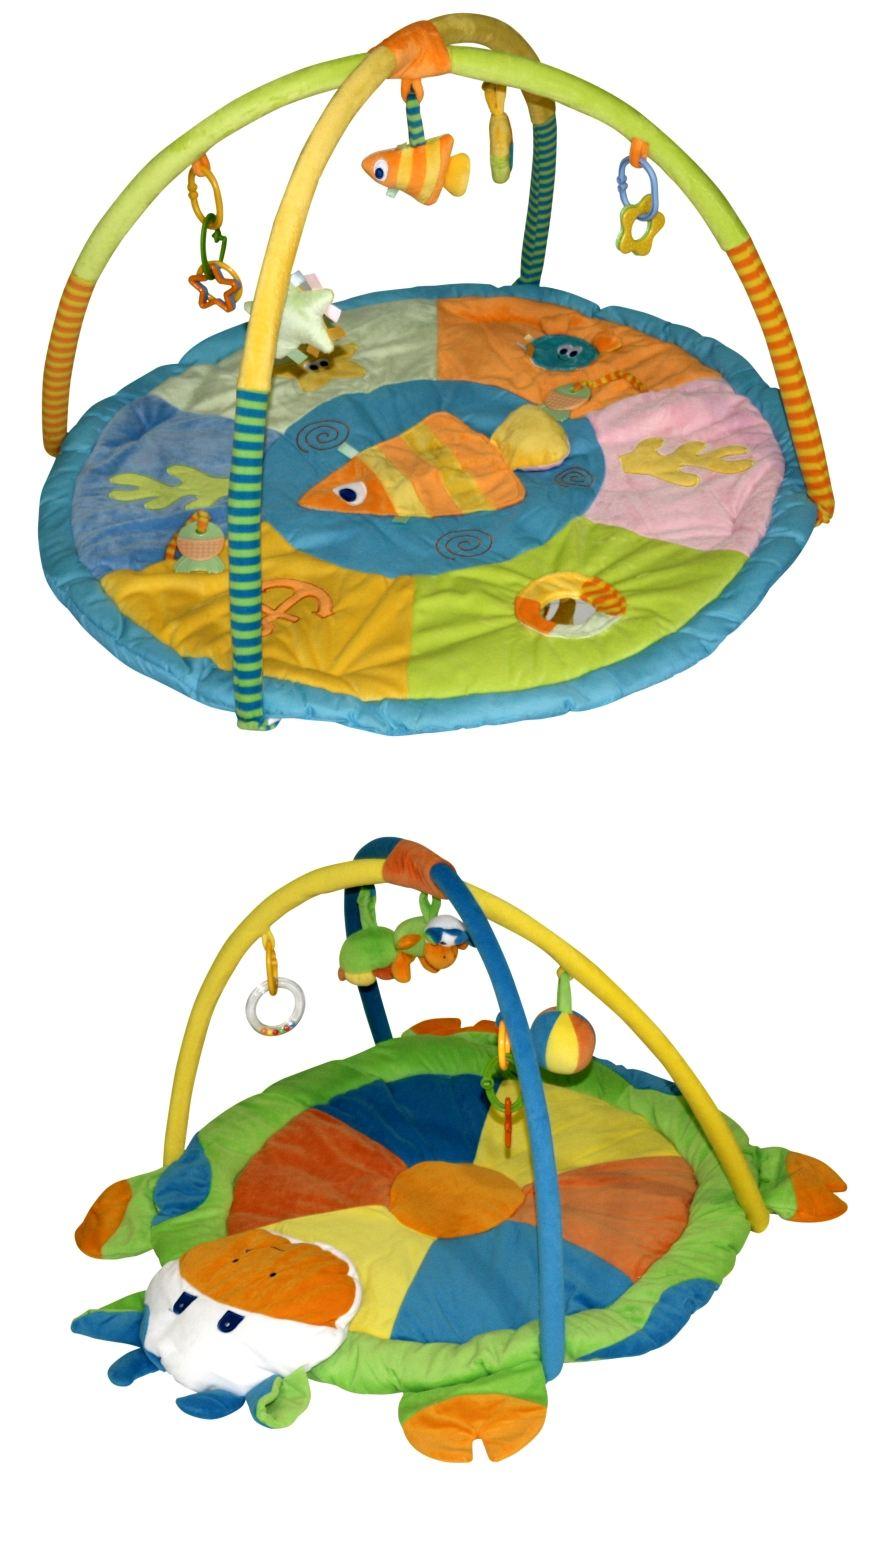 LORELLI-BABY-ACTIVITY-PLAYMAT-PLAY-MAT-GYM-FLOOR-CHILD-KID-CREATIVITY-TOYS-FUN